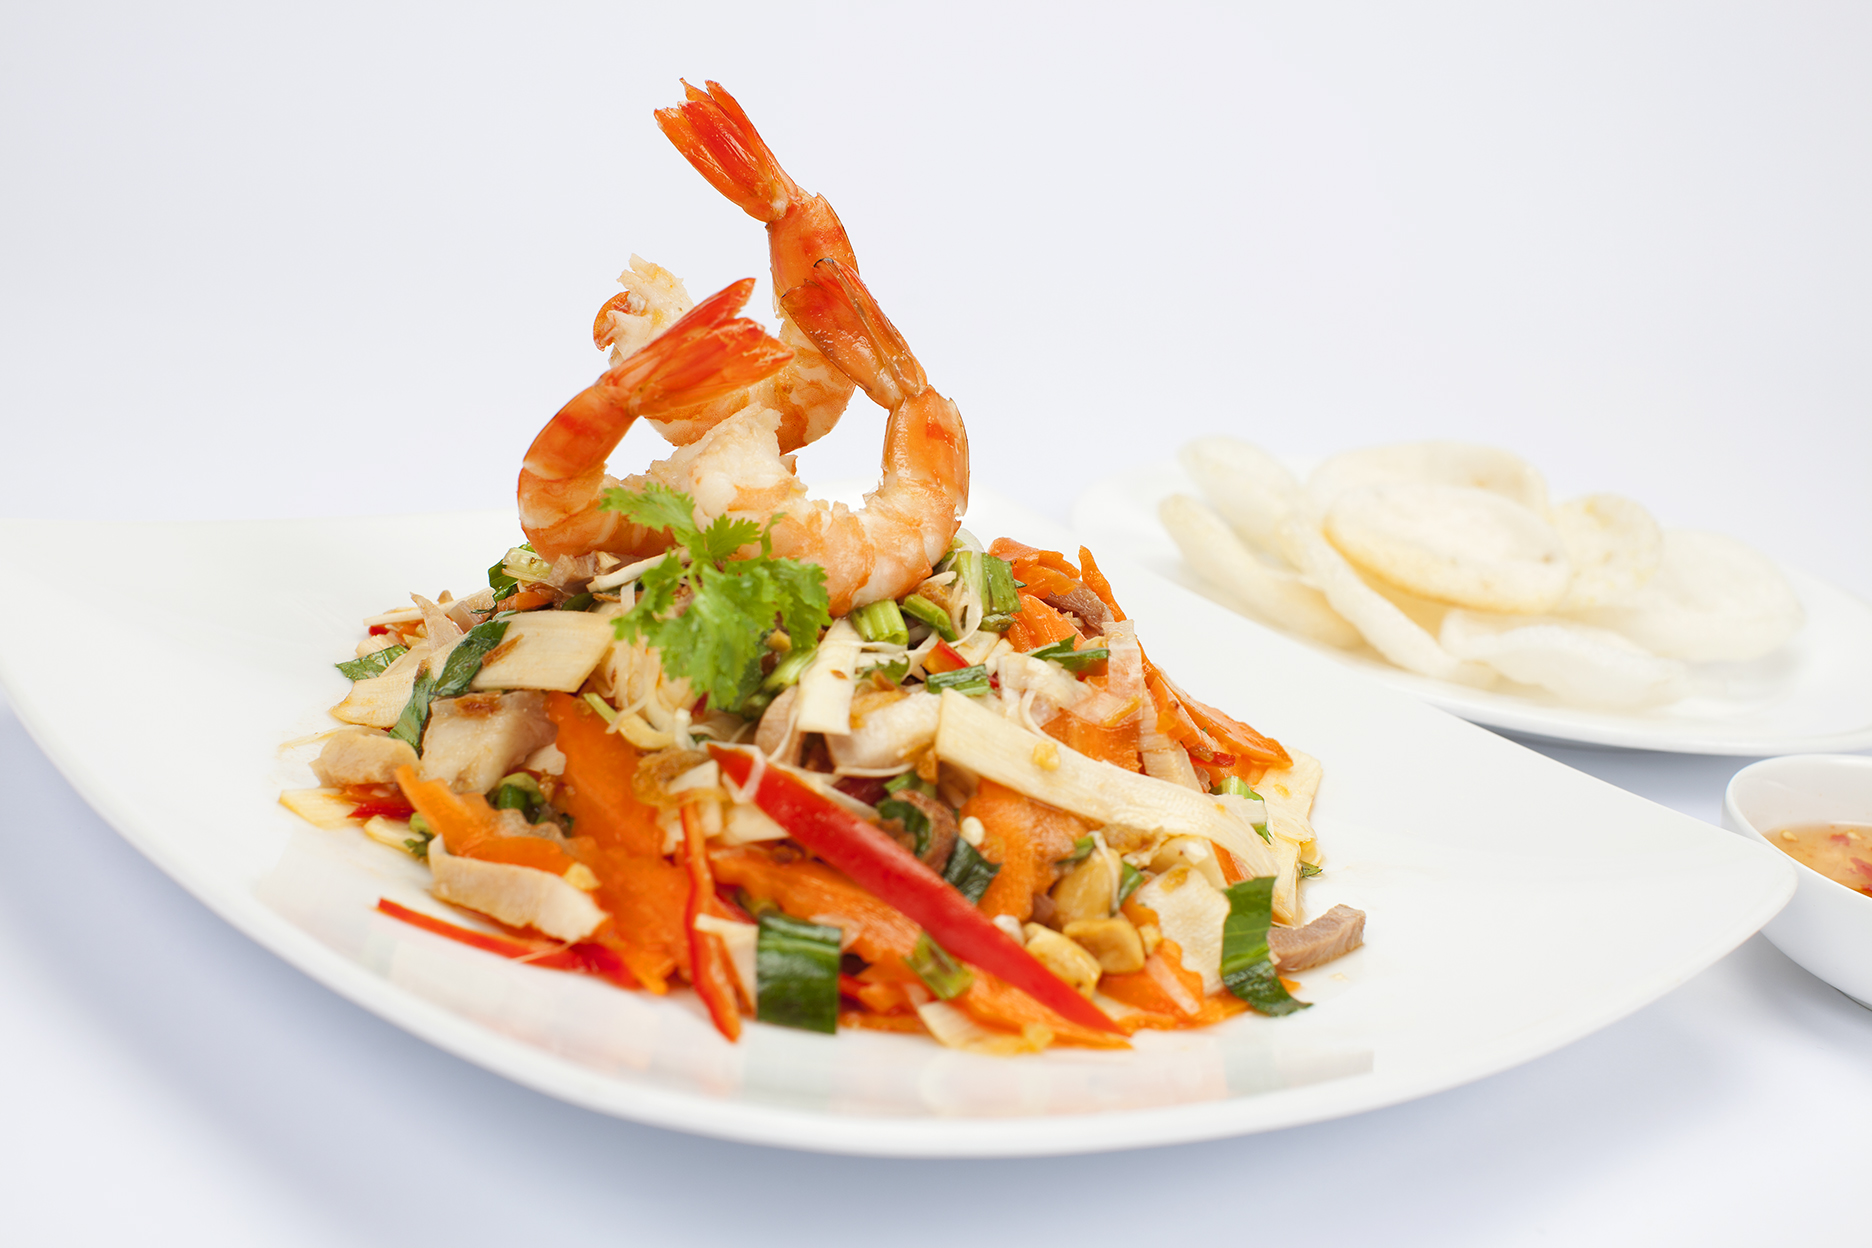 Vietnamese Food - Lotus Stem Salad - Recipe